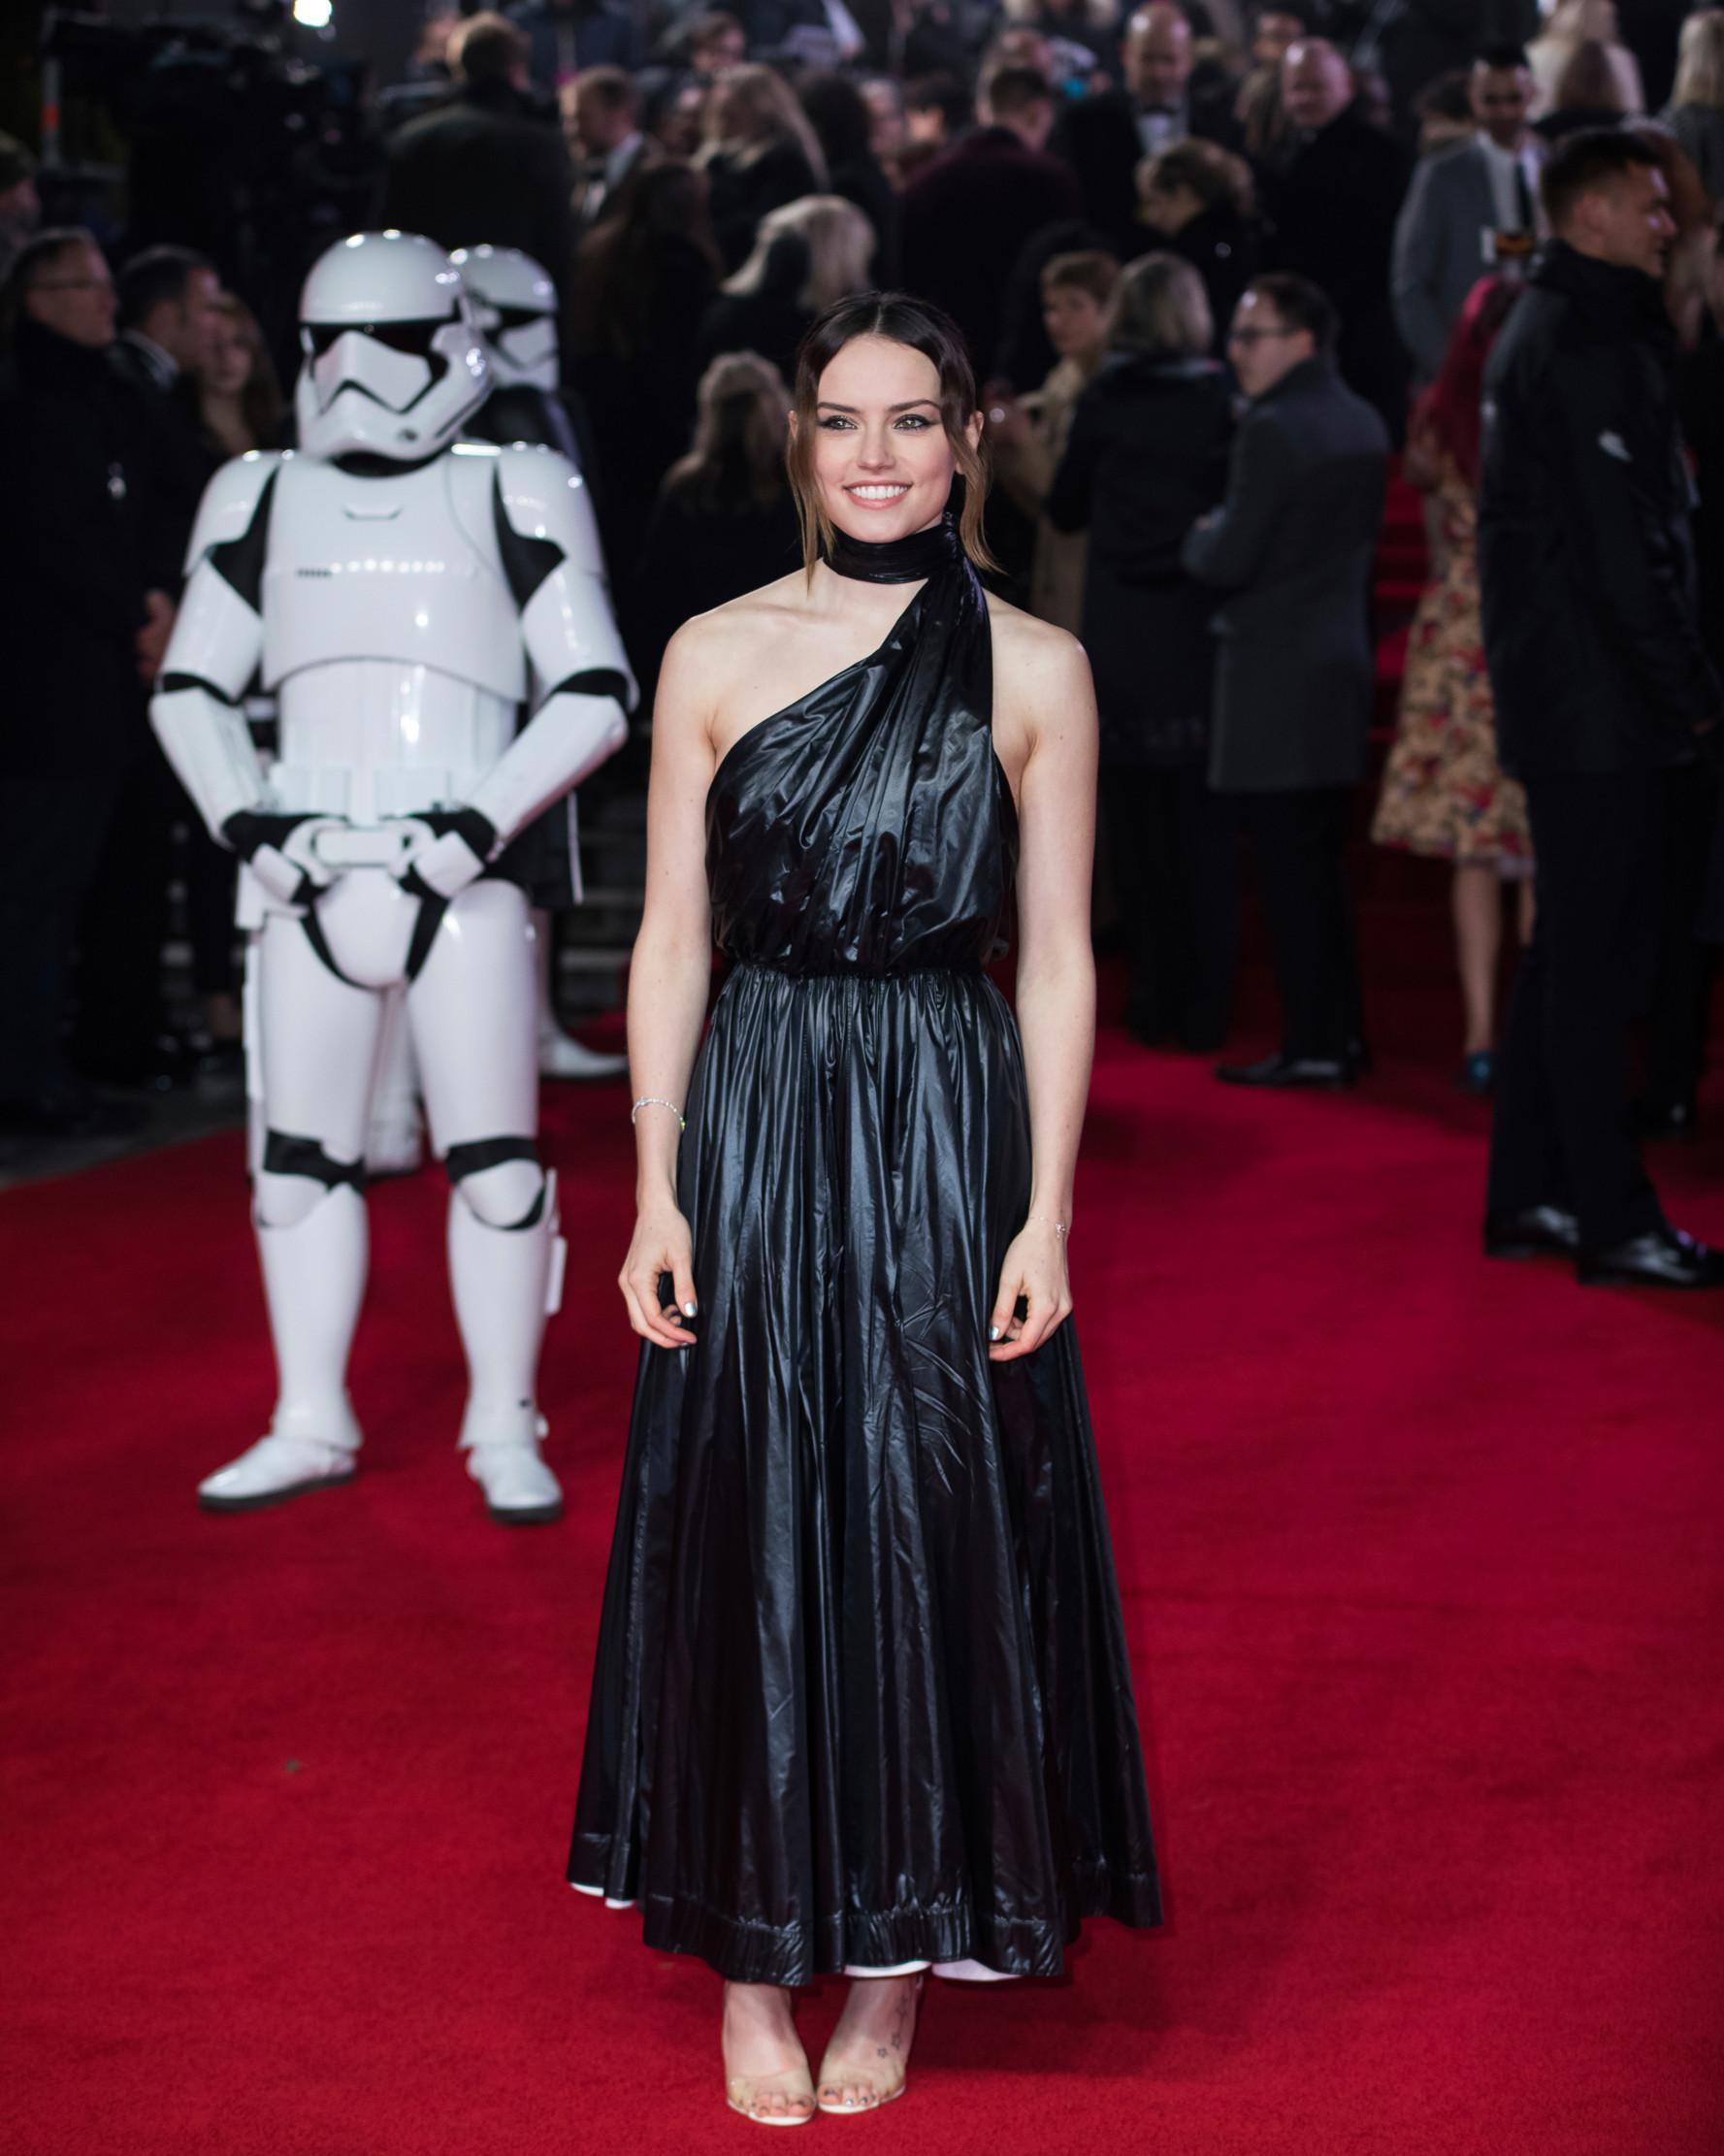 Aktris Daisy Ridley berpose setibanya pada pemutaran perdana film Star Wars: The Last Jedi di London, Selasa (12/12). Namun tak hanya pujian, banyak juga yang mengomentari gaun Ridley yang dianggap mirip kantong plastik hitam (Vianney Le Caer/Invision/AP)